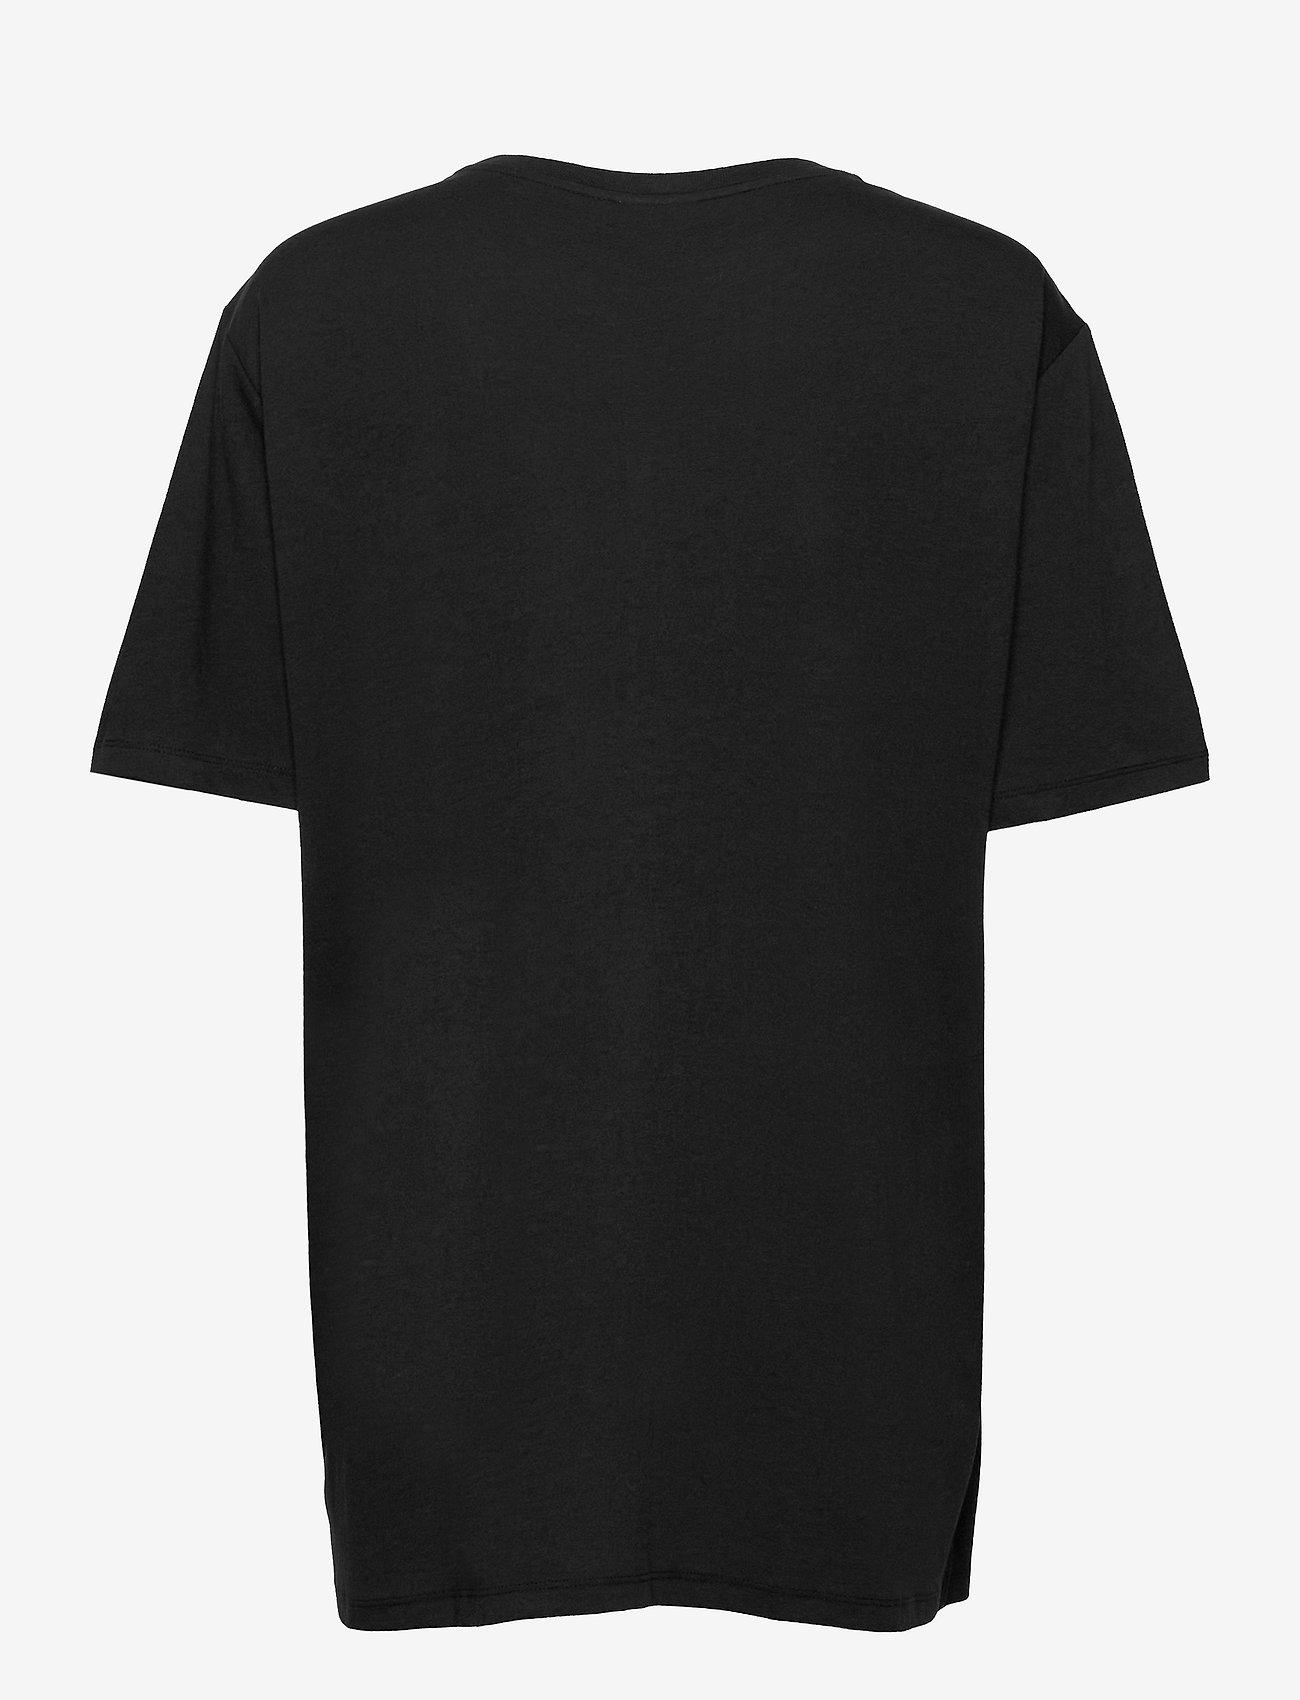 Boob - The-shirt oversized - t-shirts - black - 1